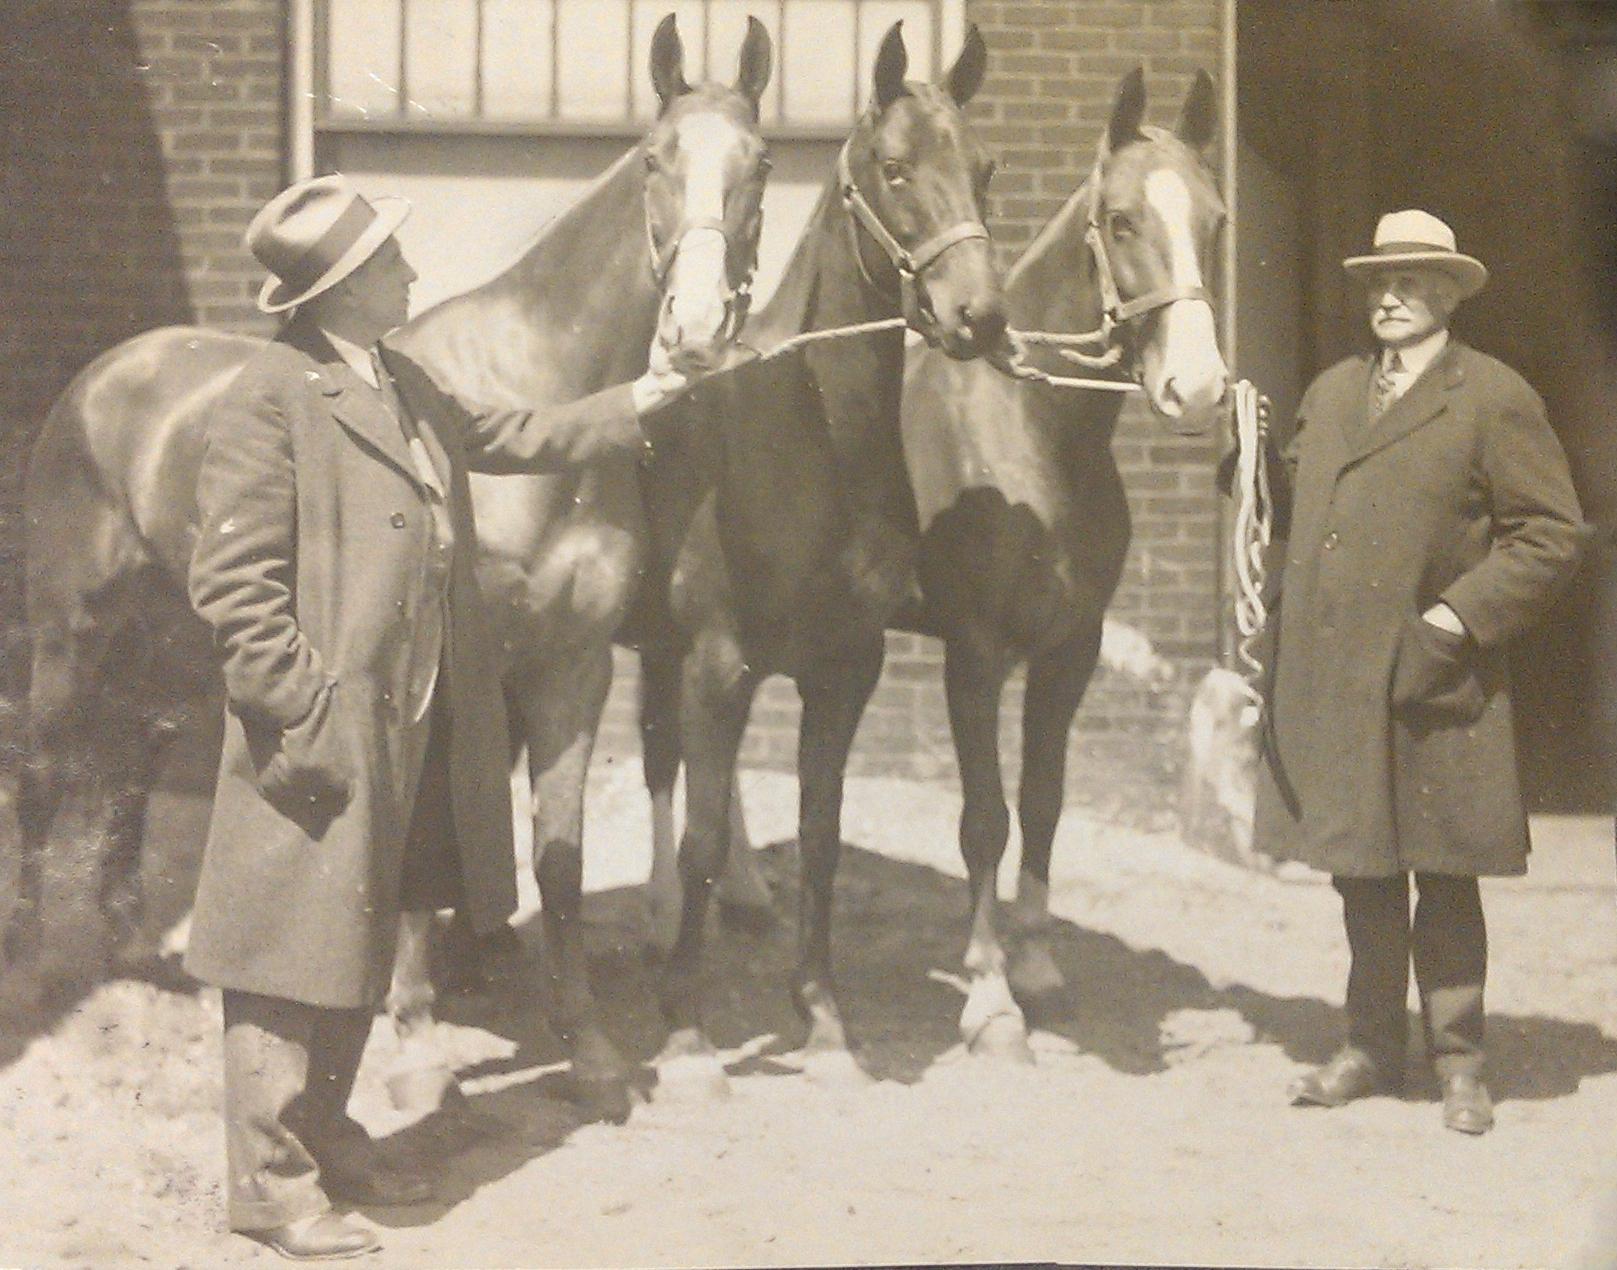 Arthur G. Hopcraft and A.C. Pencock 1928